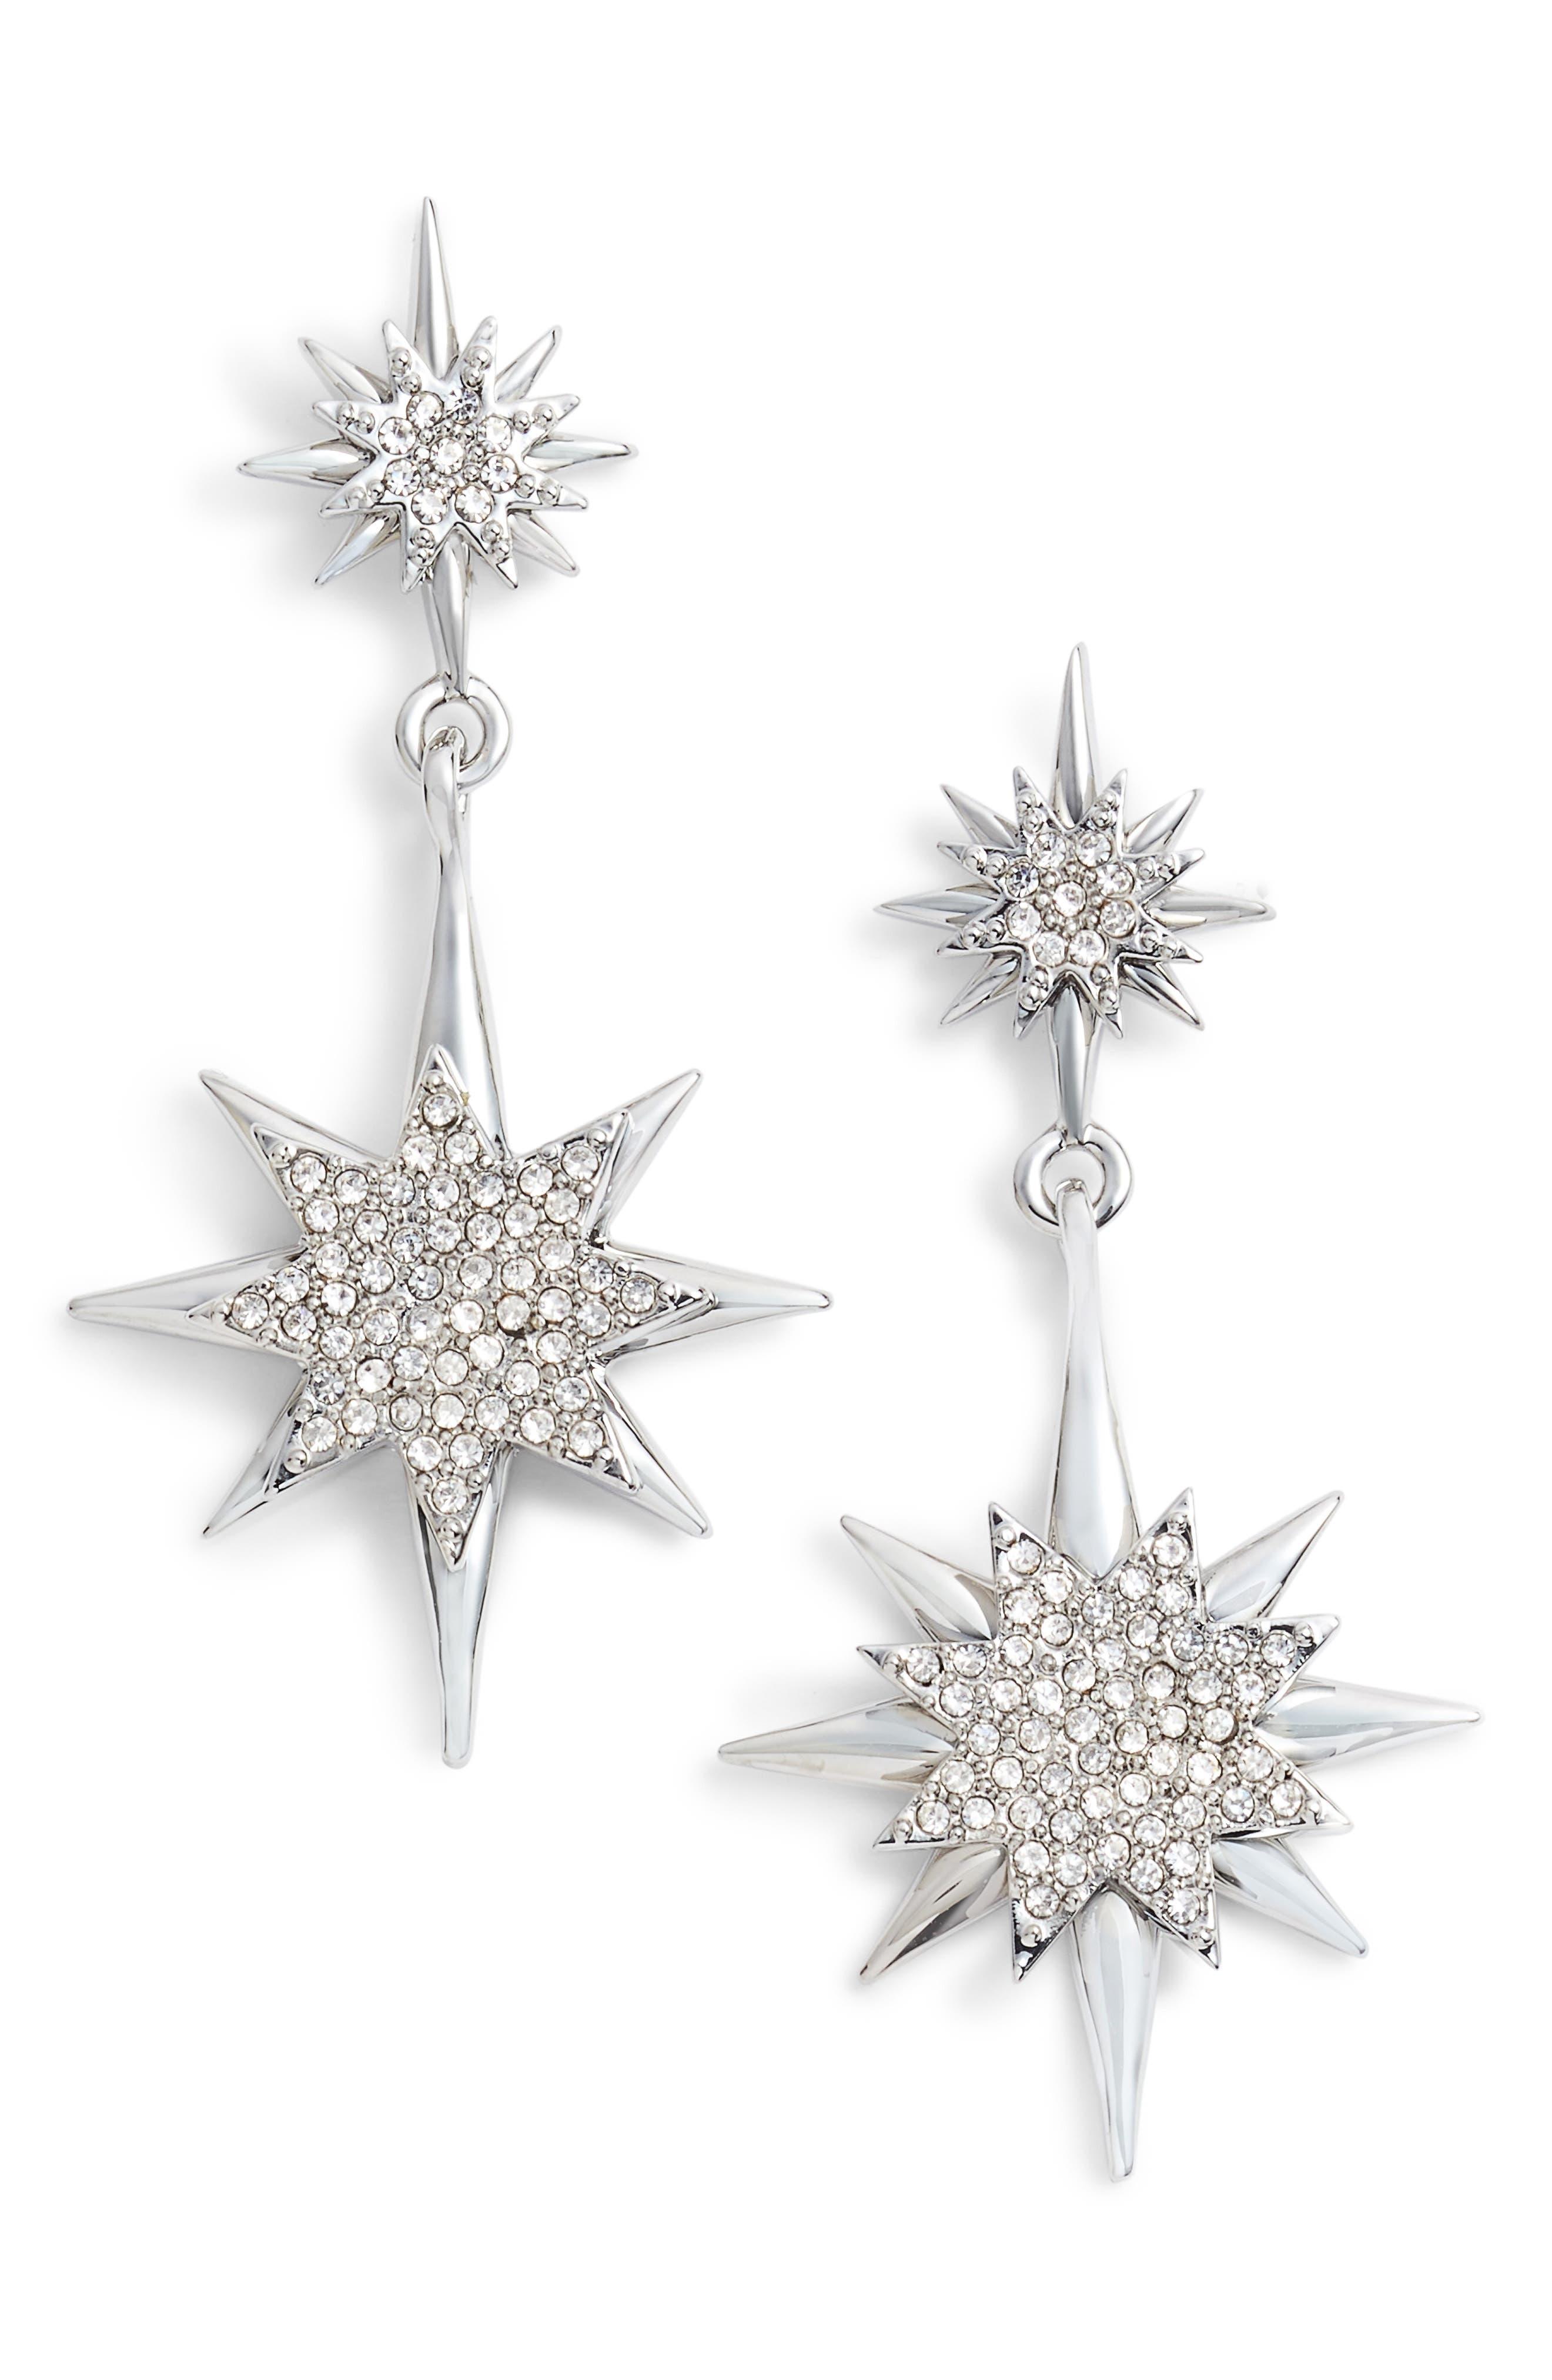 Crystal Starburst Drop Earrings,                             Main thumbnail 1, color,                             040